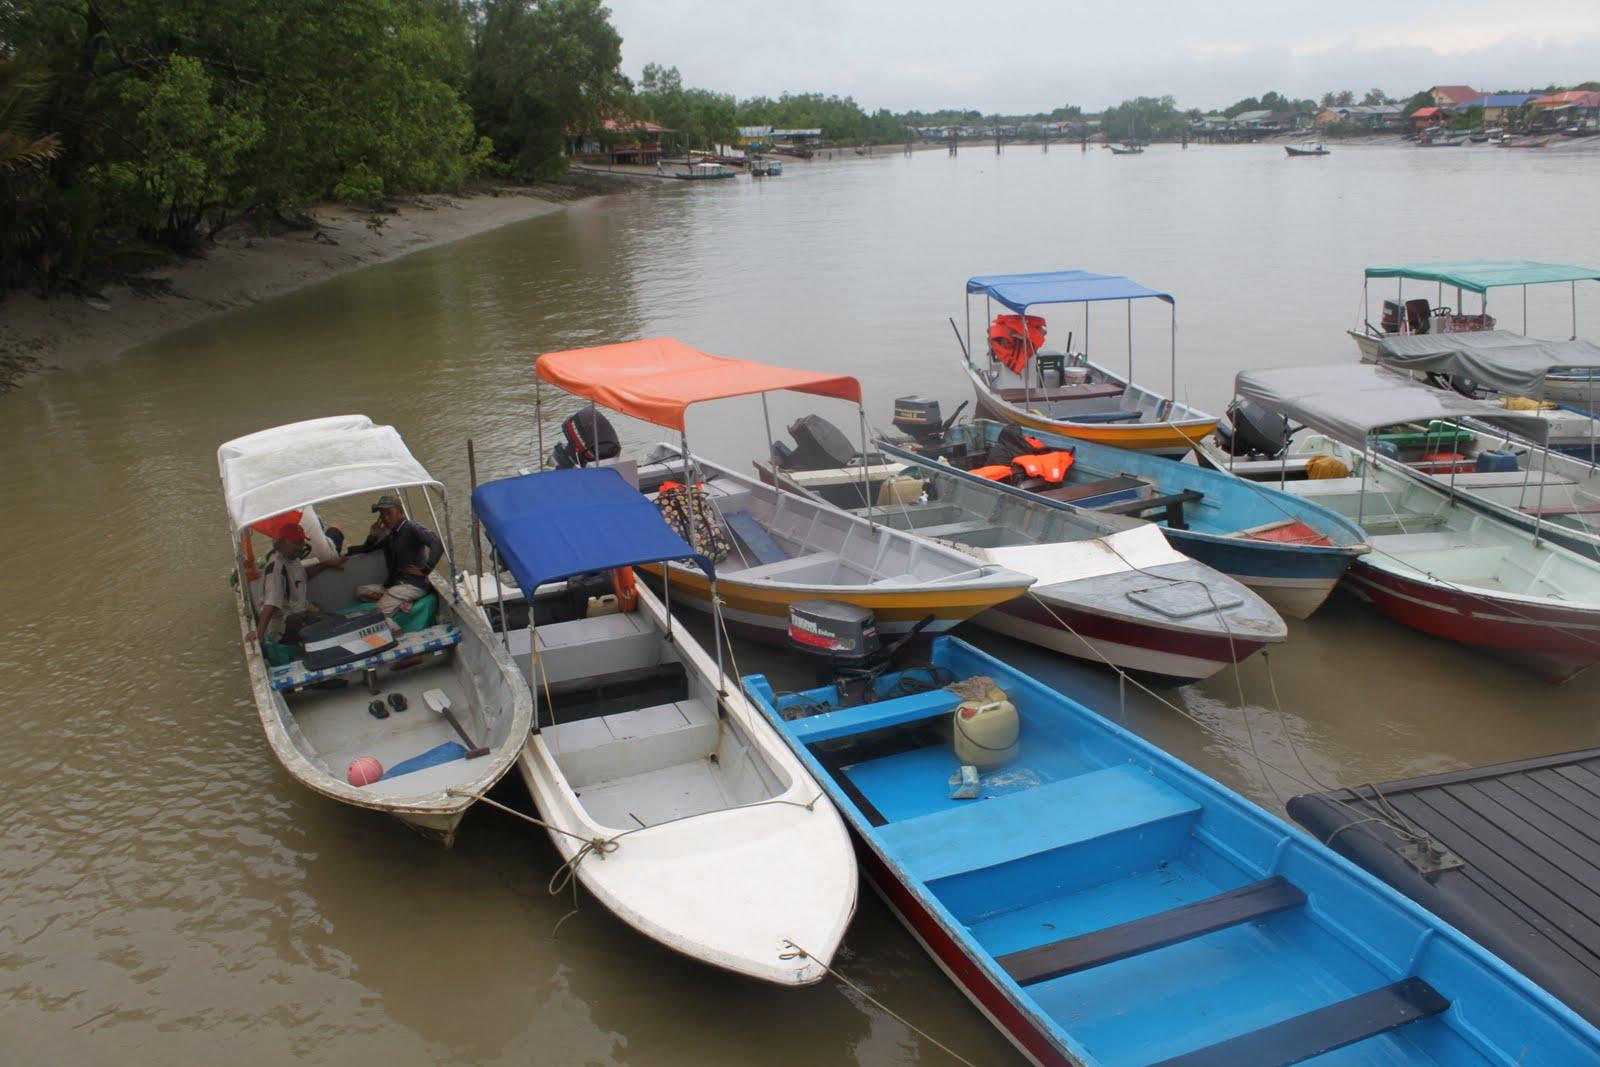 http://3.bp.blogspot.com/_GtcOcDxYuf0/S_fghwyGdII/AAAAAAAABvU/QFrgwMnHevs/s1600/boats%2Bfor%2Bhire.jpg